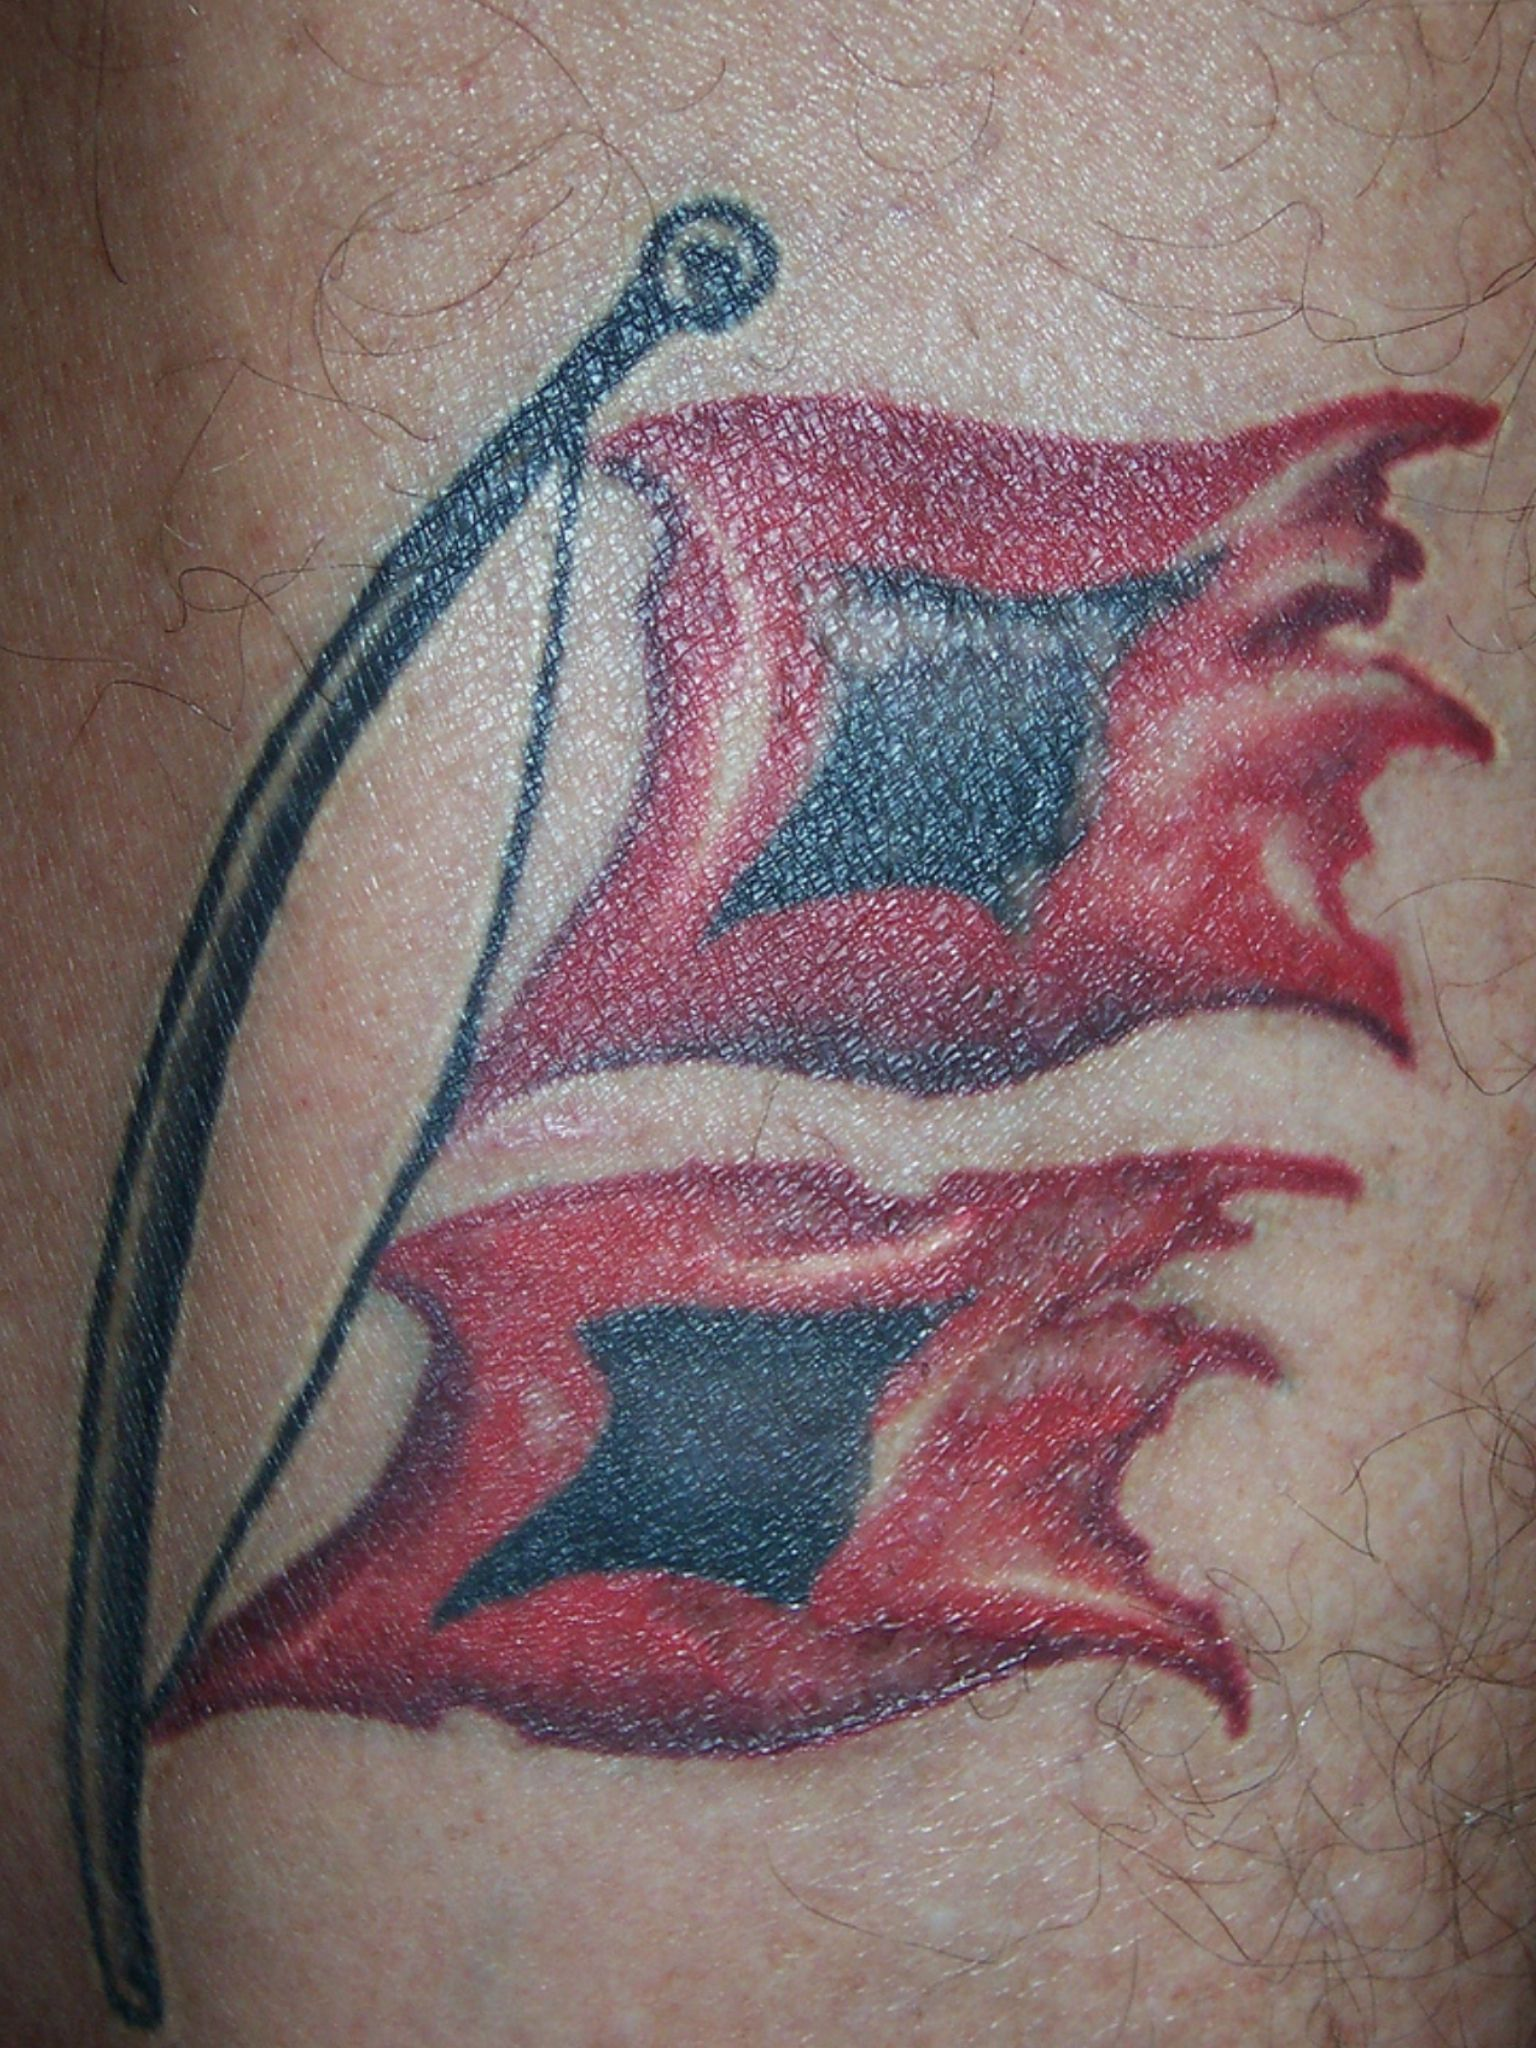 Hurricane flag tattoo tattoo flash pinterest hurricane flag hurricane flag tattoo biocorpaavc Images